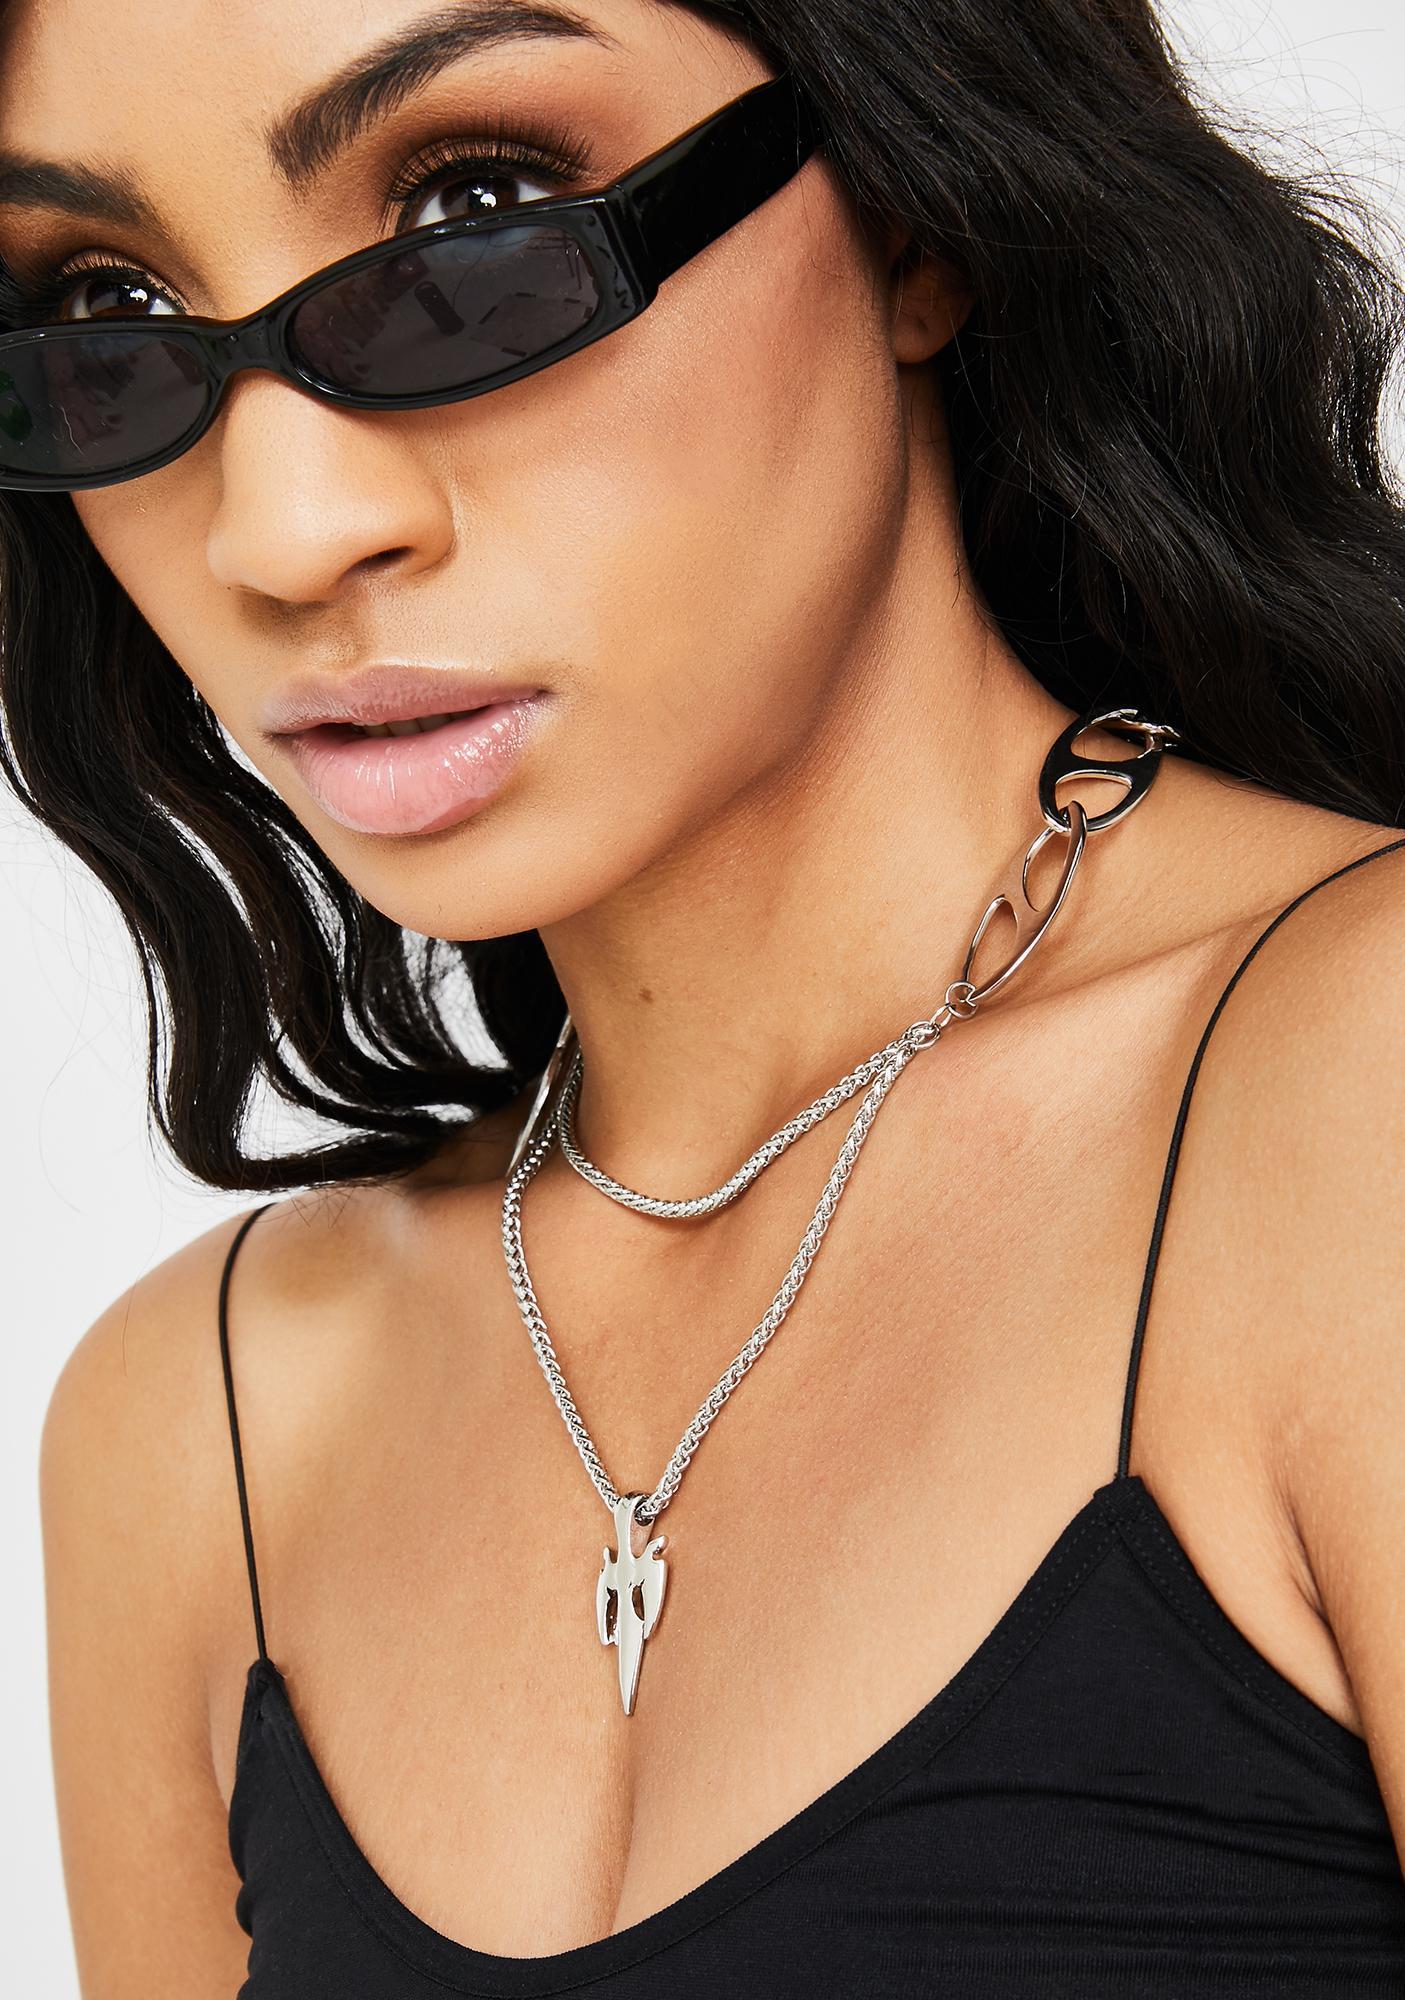 Dreadful Daggers Chain Necklace